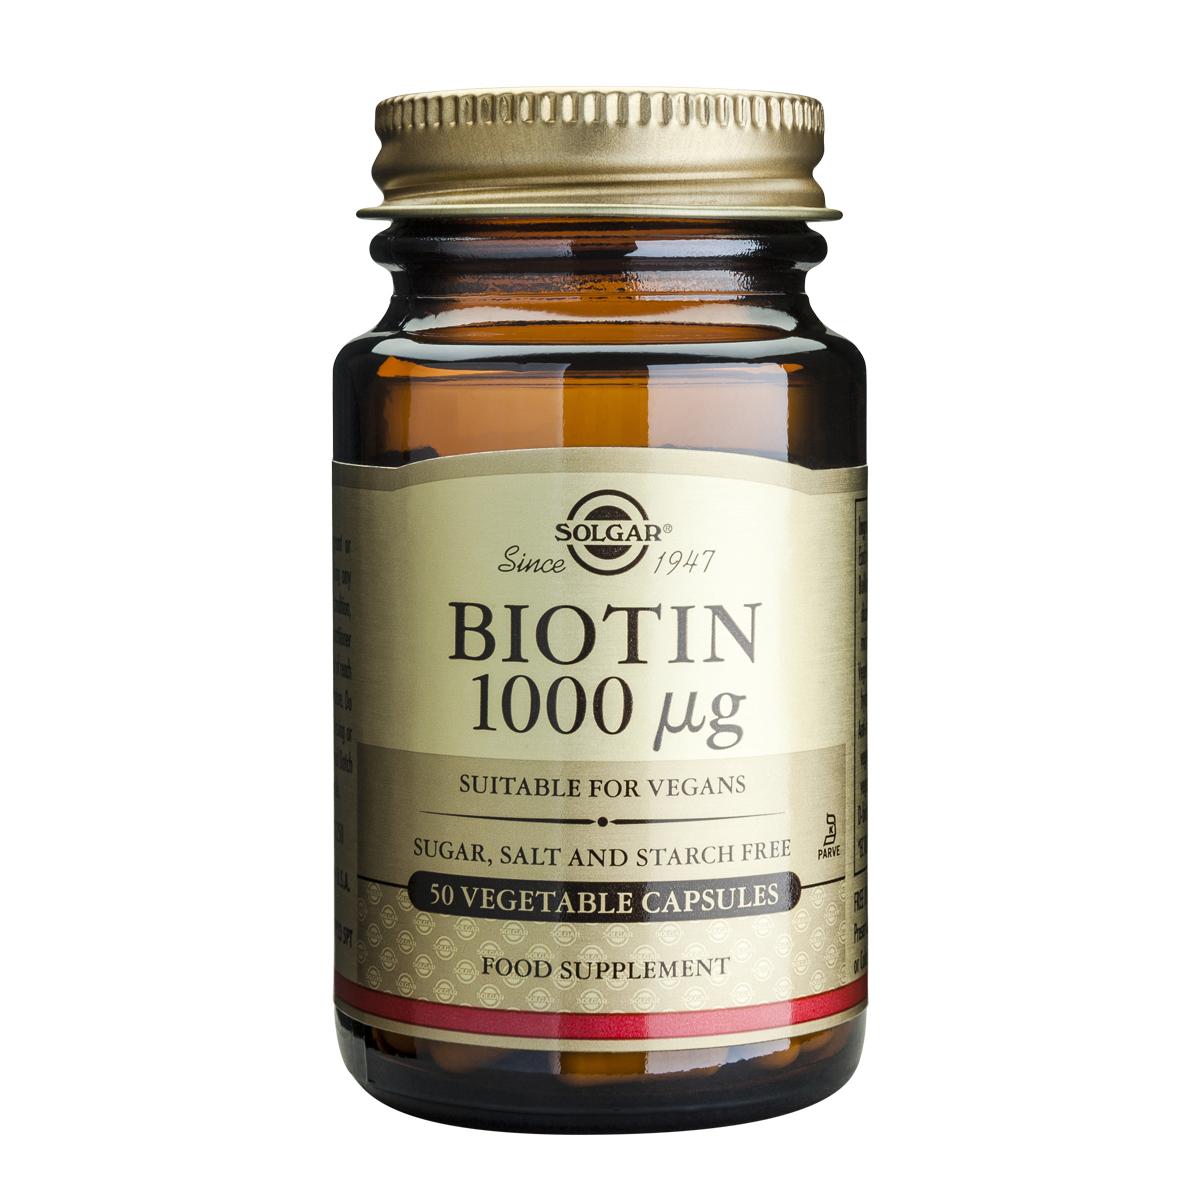 Billede af Solgar Biotin - 1000 mcg - 50 stk.